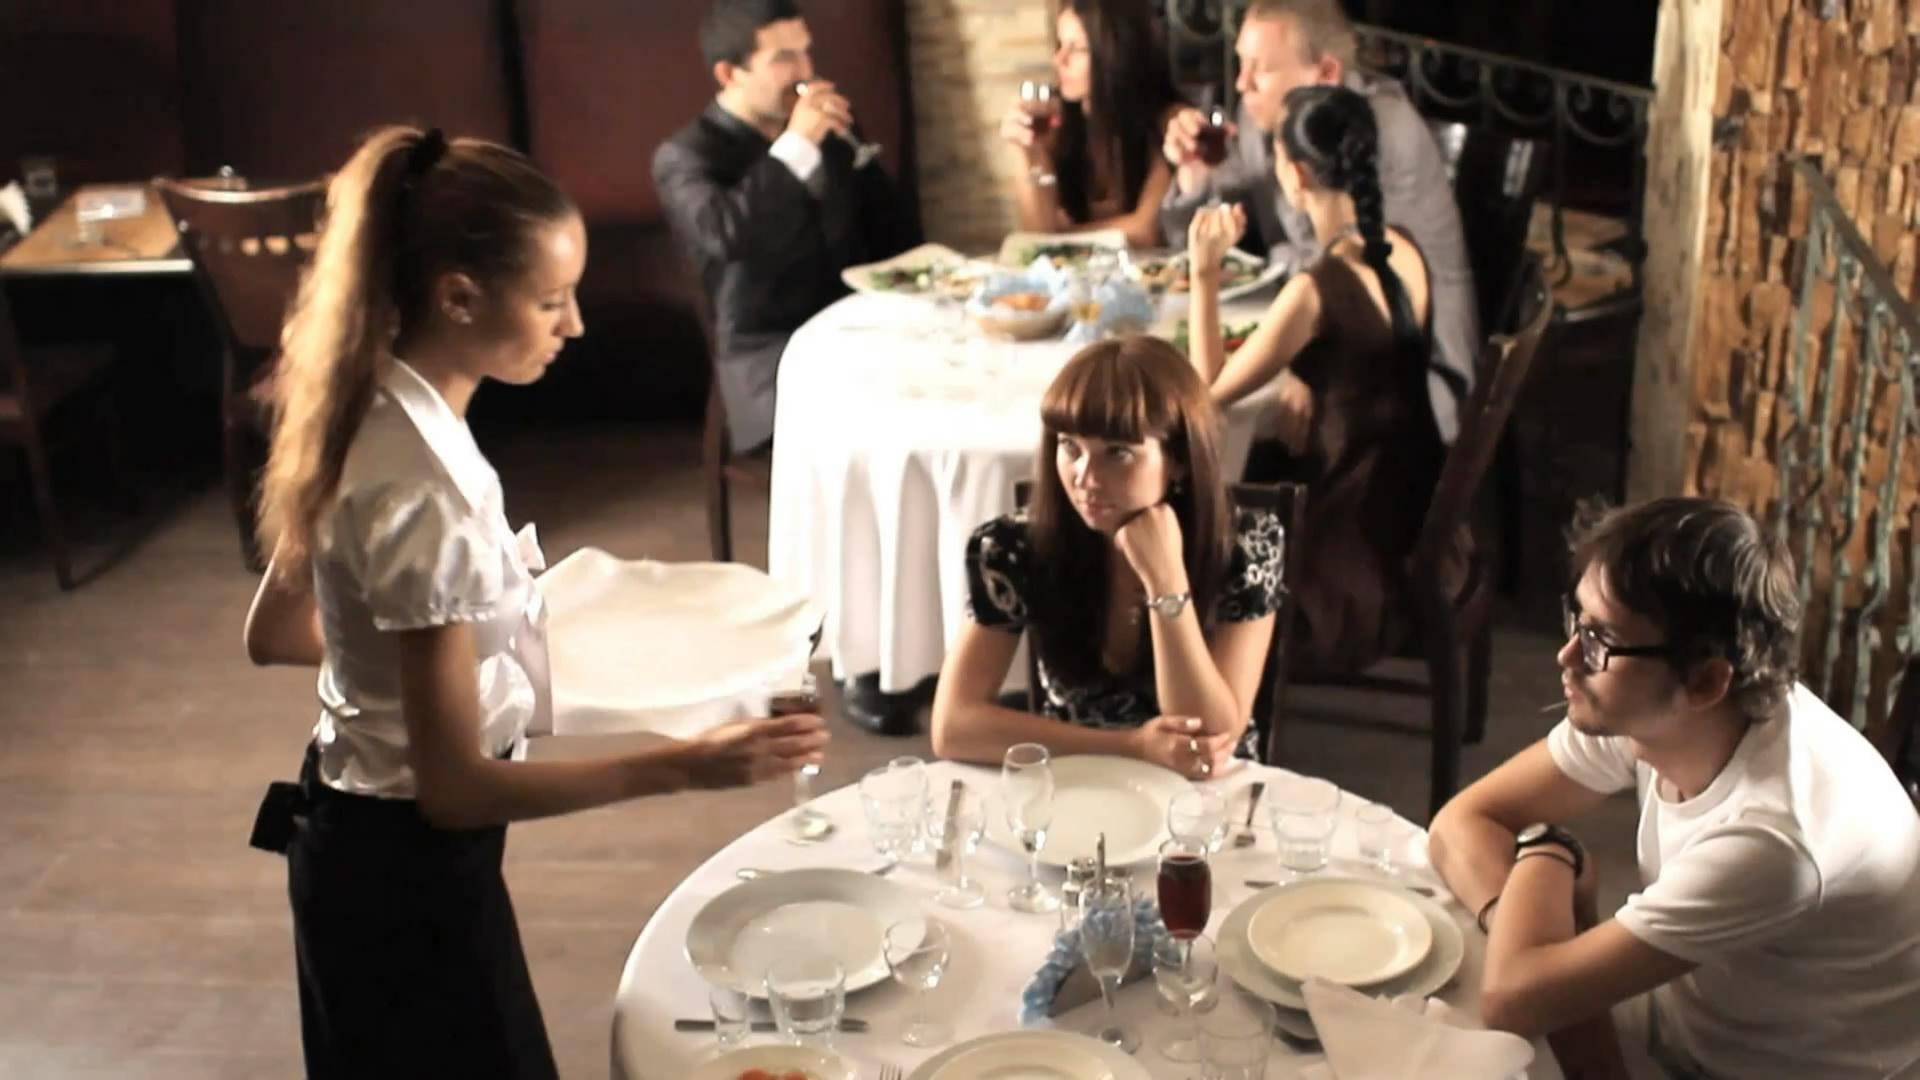 Bahh Tee и Нигатив (Триада) - Ты меня не стоишь (2011)